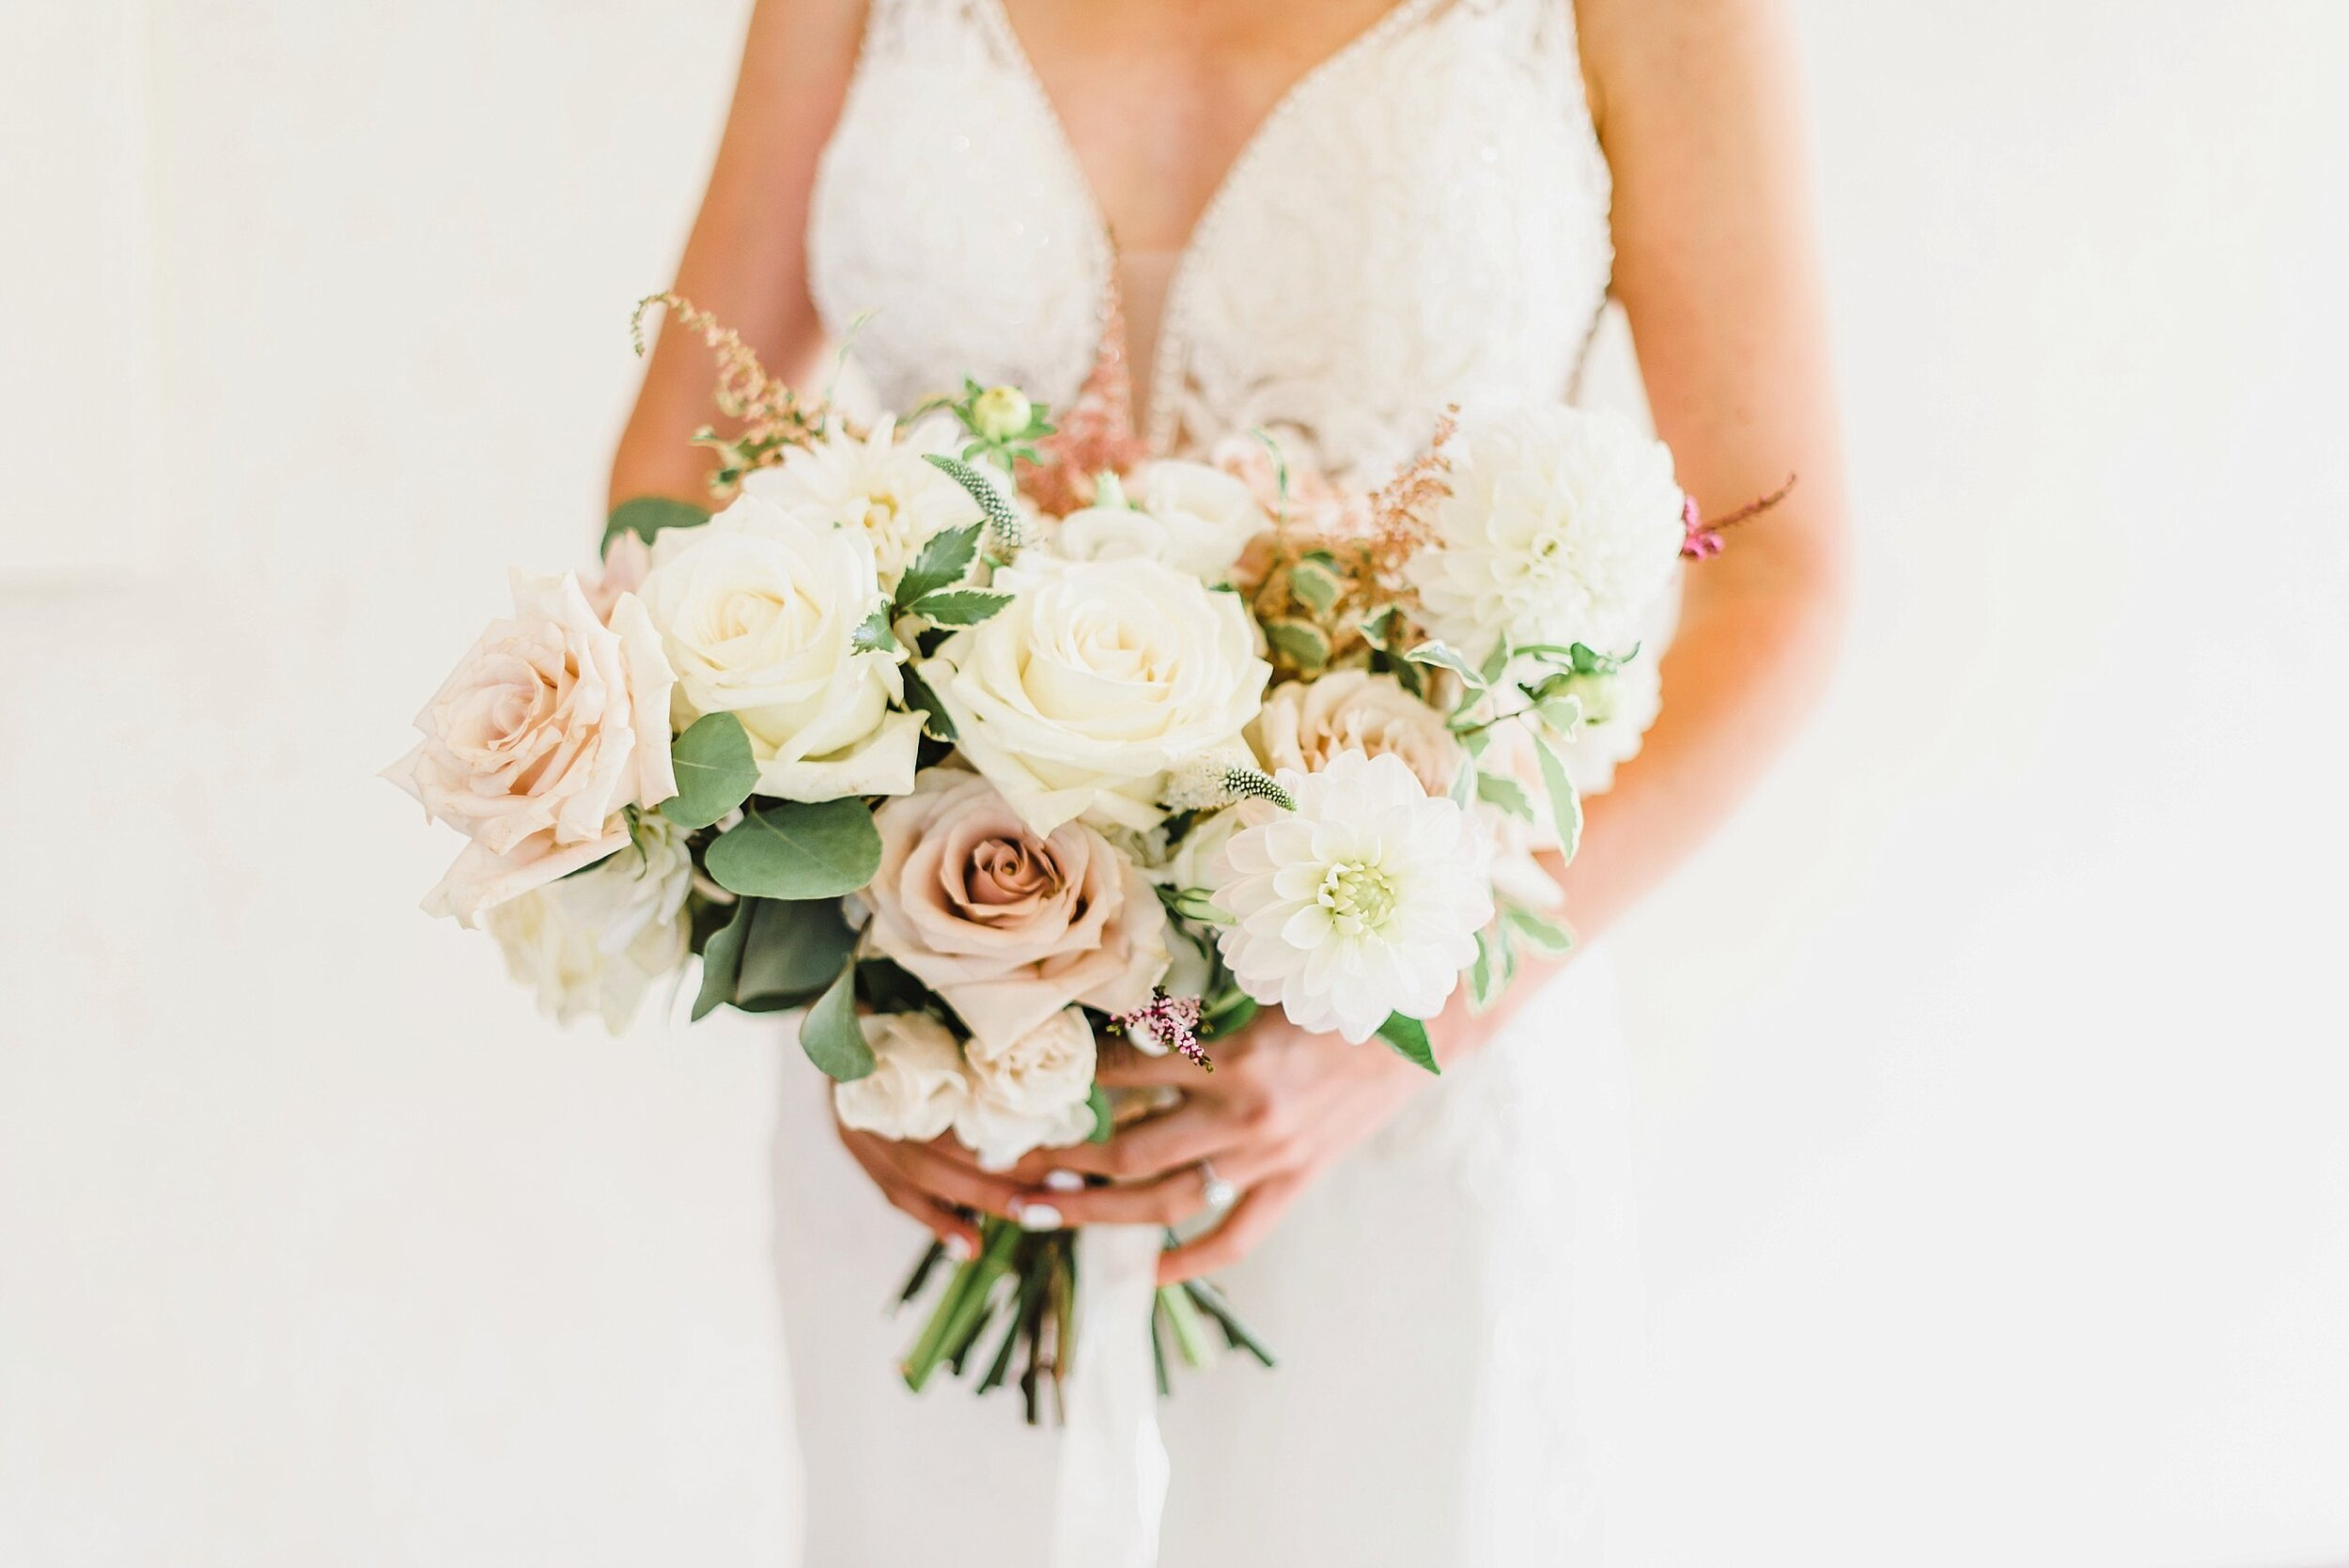 light airy fine art ottawa wedding photographer | Ali and Batoul Photography | Fairmont Le Chateau Montebello11.jpg